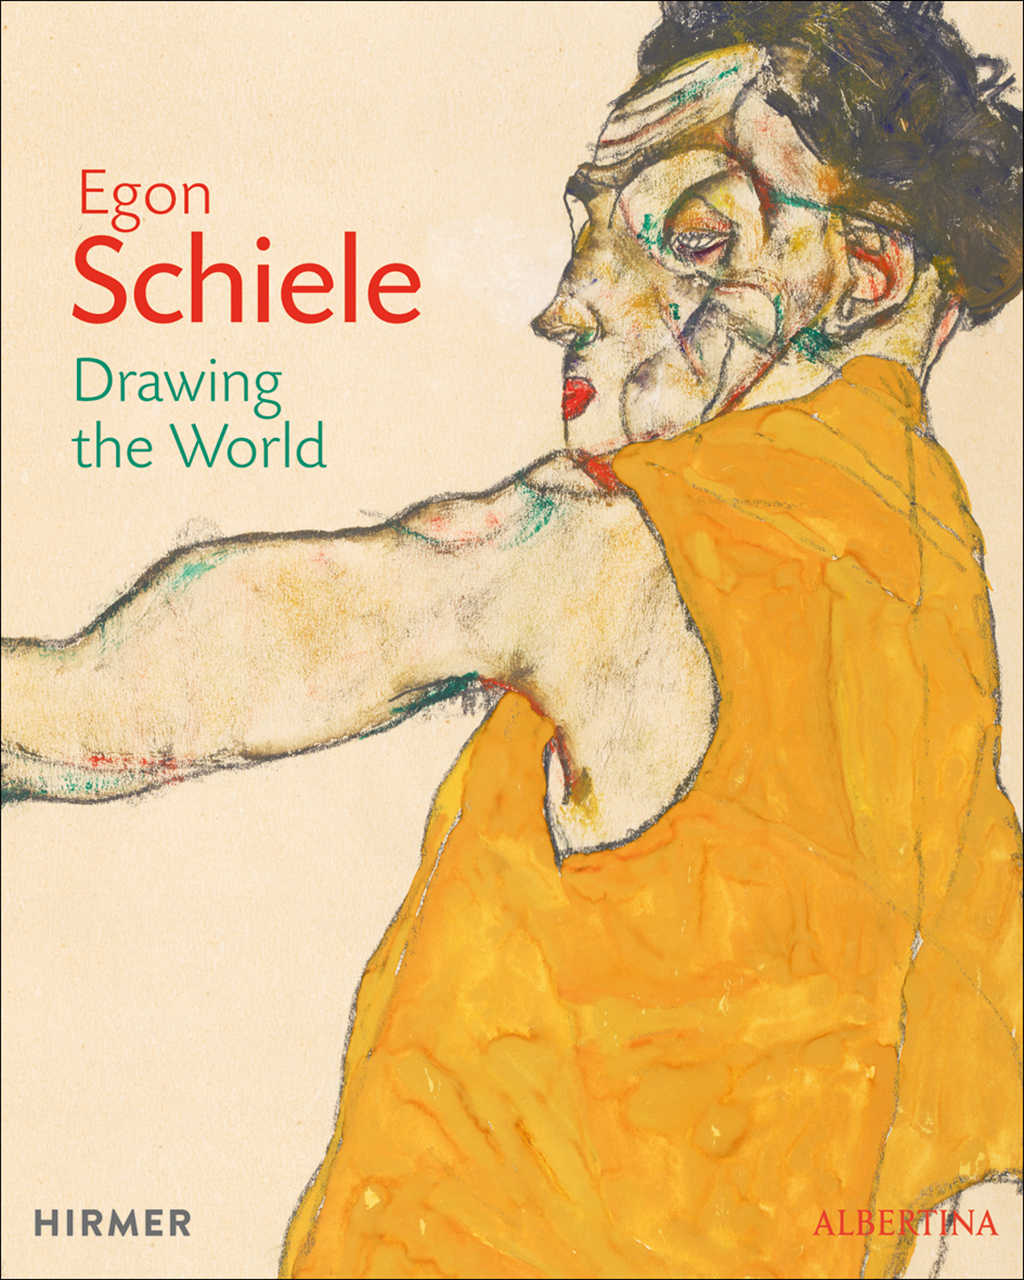 Egon Schiele: Drawing the World